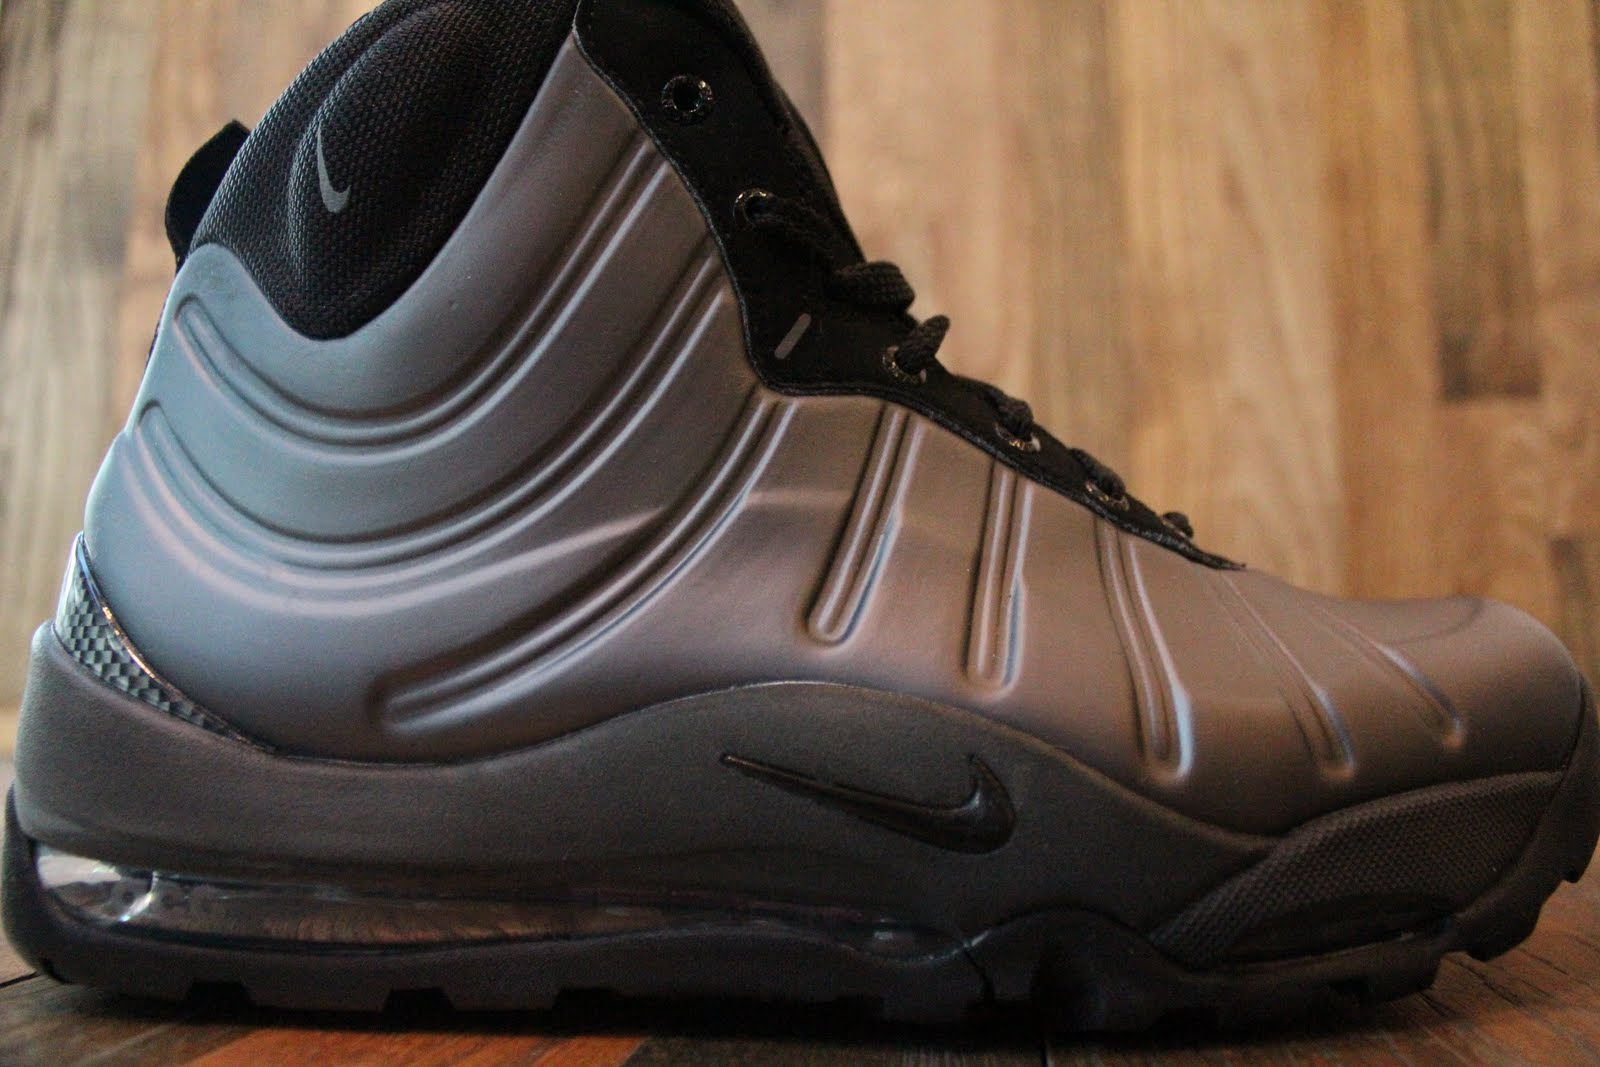 e8da14bb21b Nike ACG Air Max Posite Bakin Boot Metallic Dark Grey Black-Dark Grey-Team  Orange 415327-008. November 2011